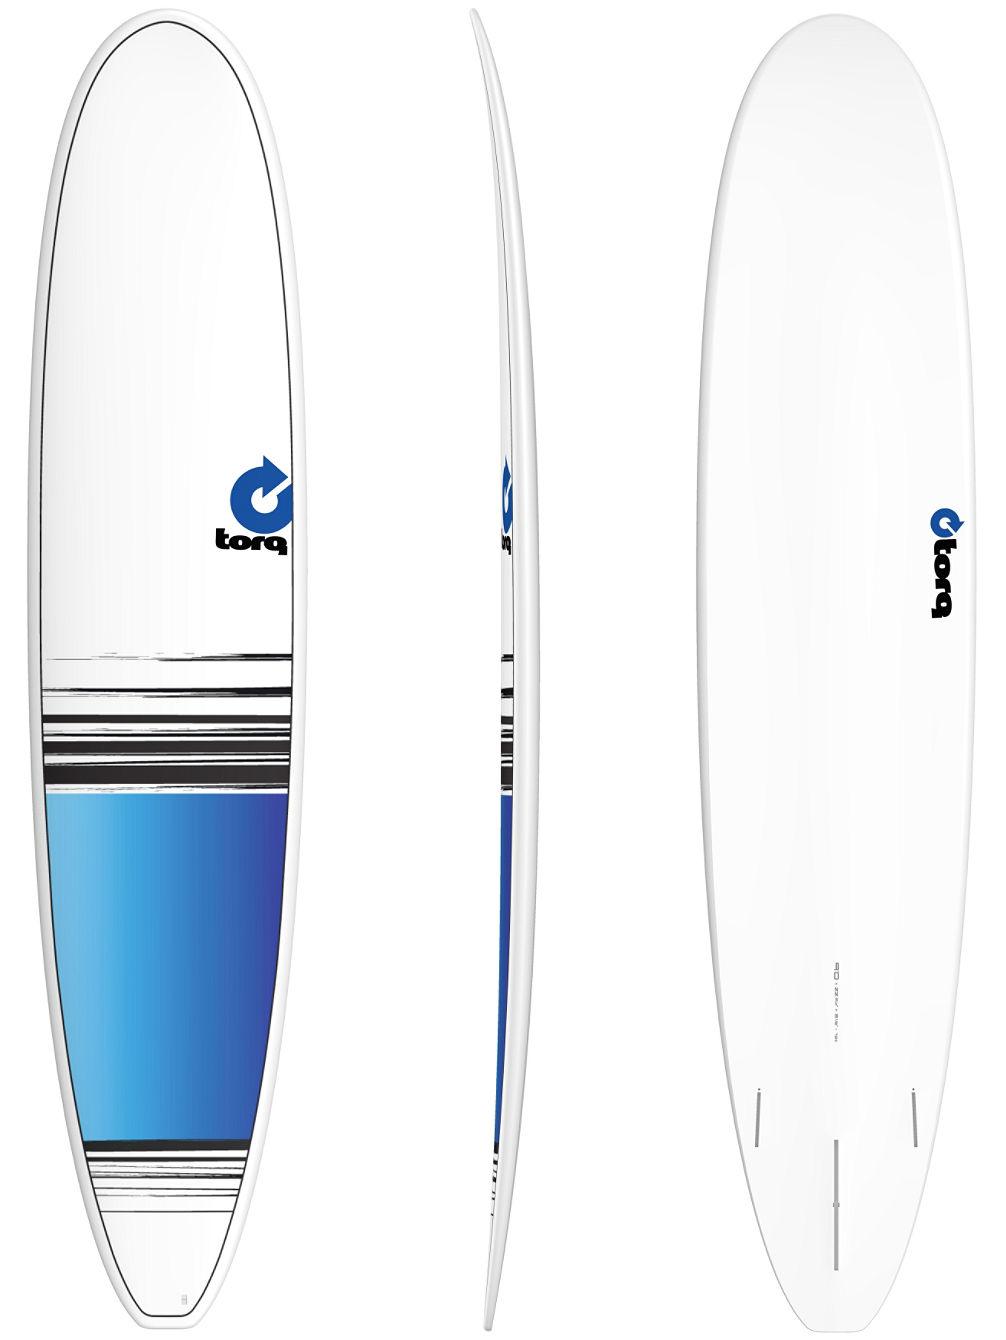 Compra torq tet 9 0 longboard tavola da surf online su - Misure tavole da surf ...